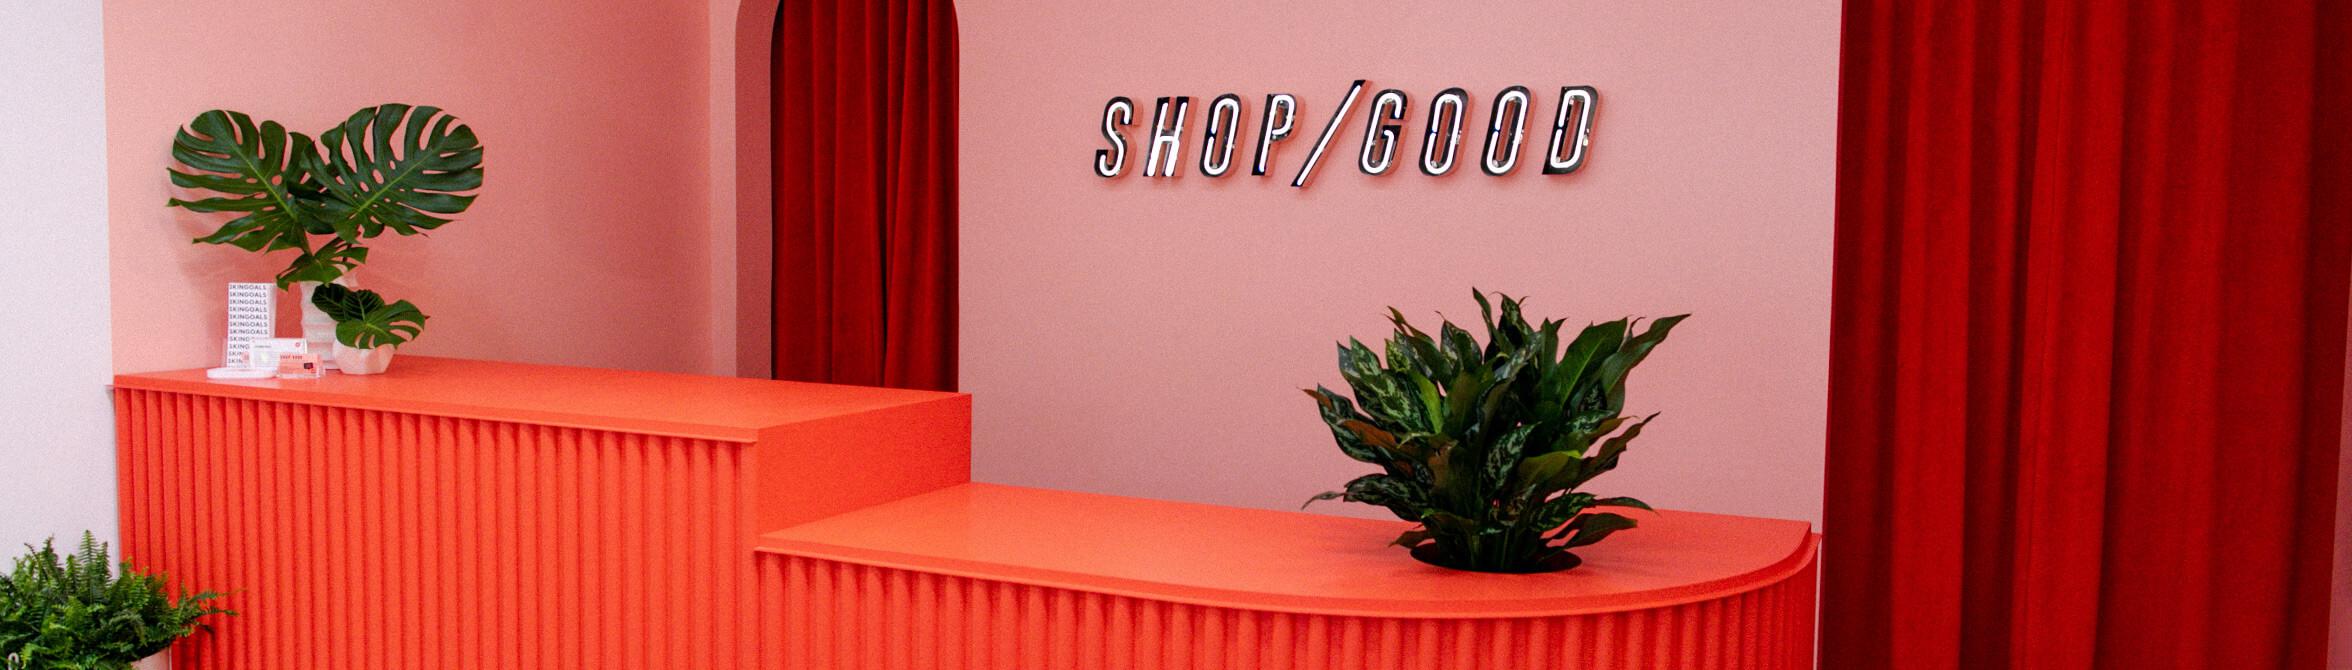 Shop Good: website